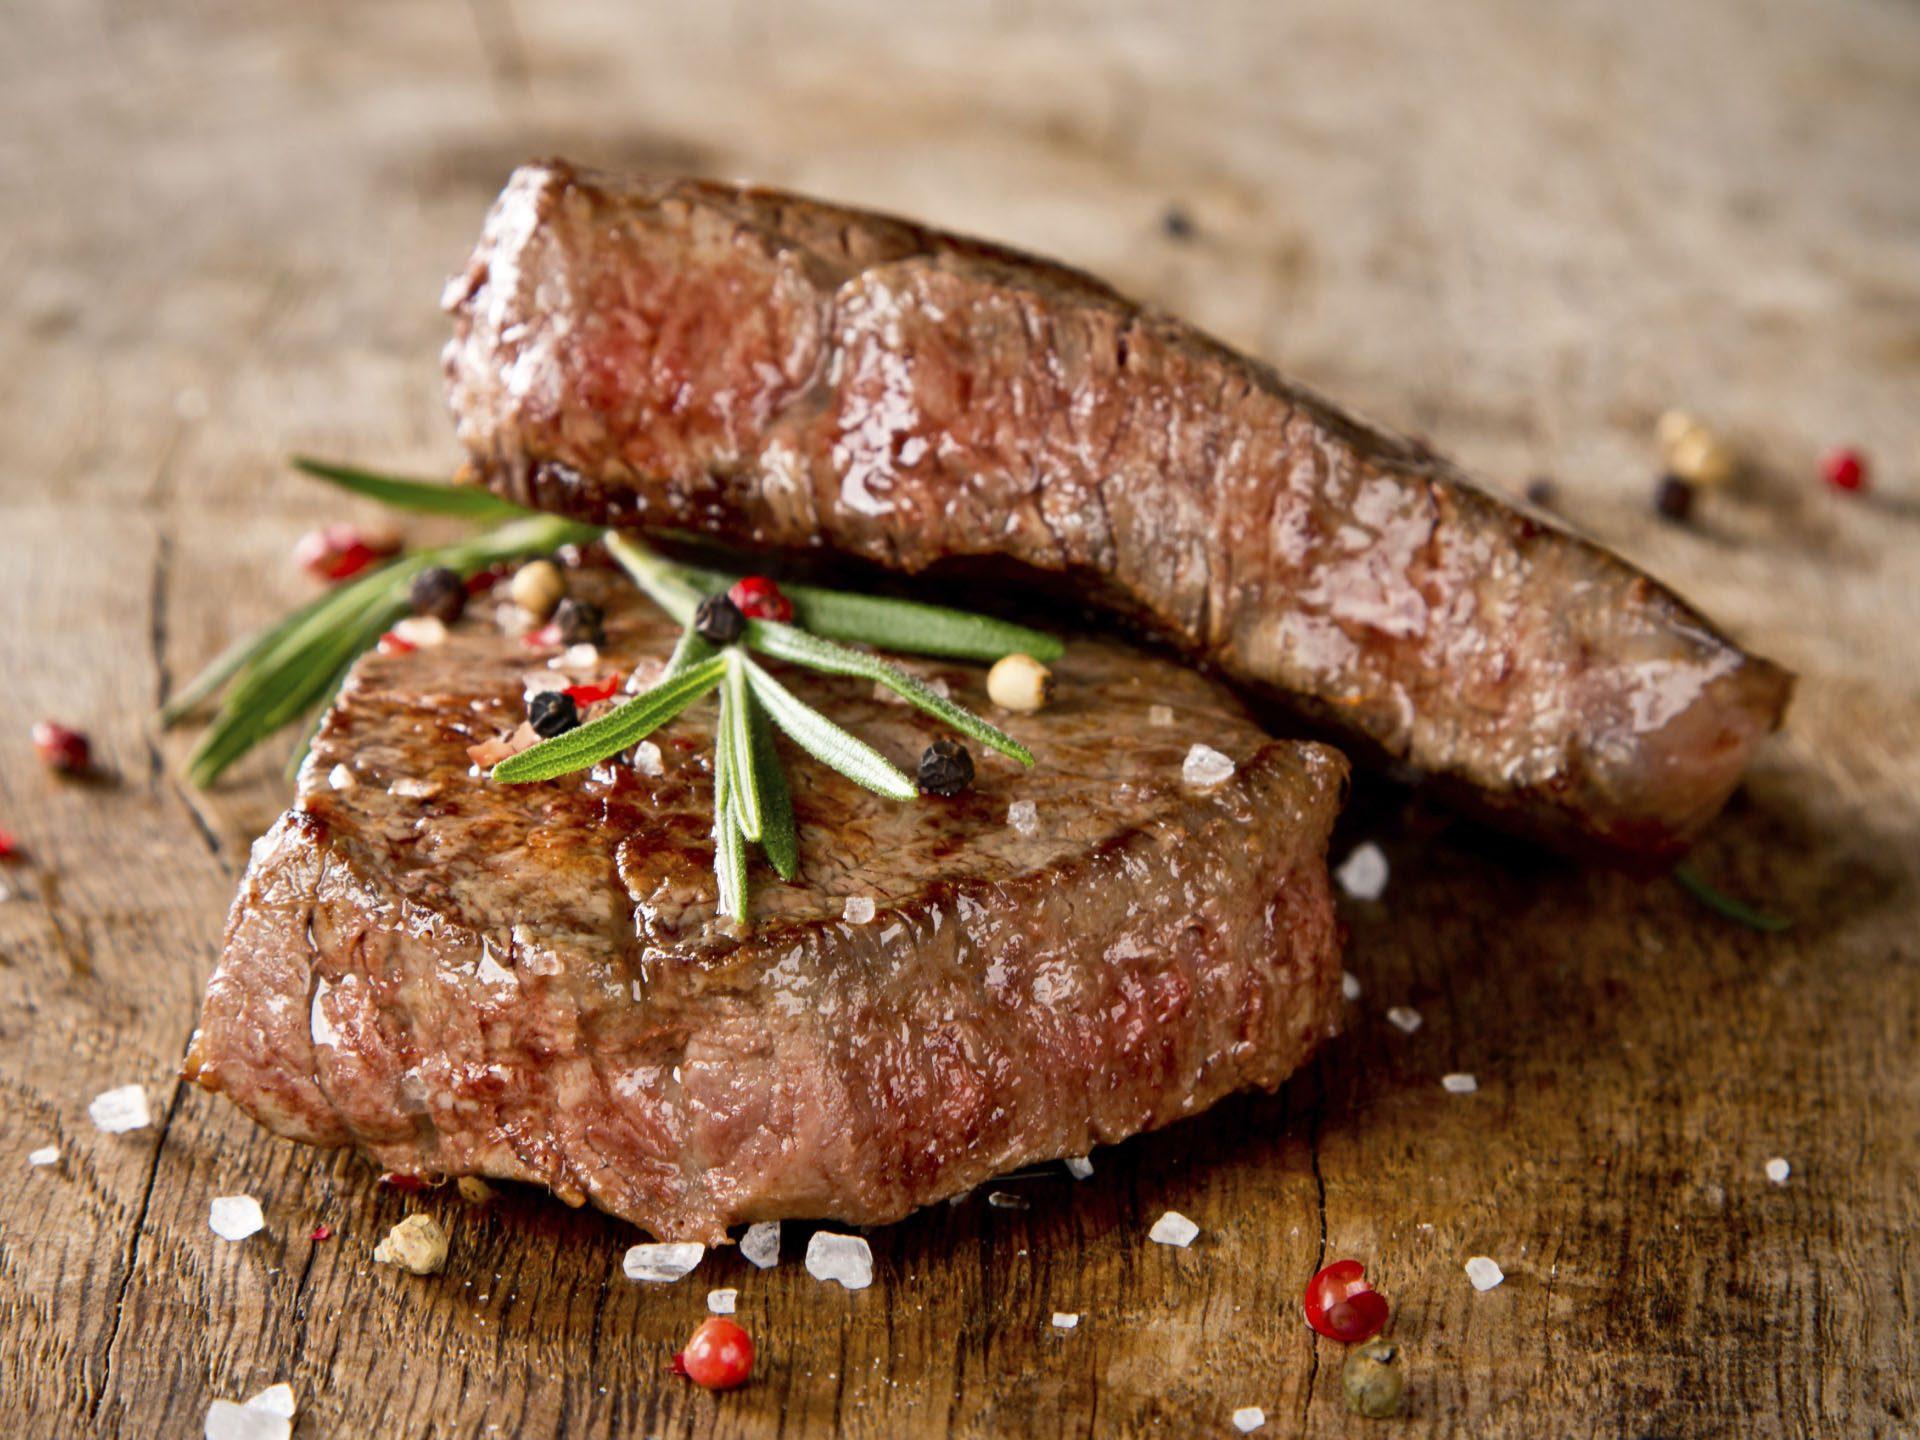 Don't Let Your Steak Rest Cold